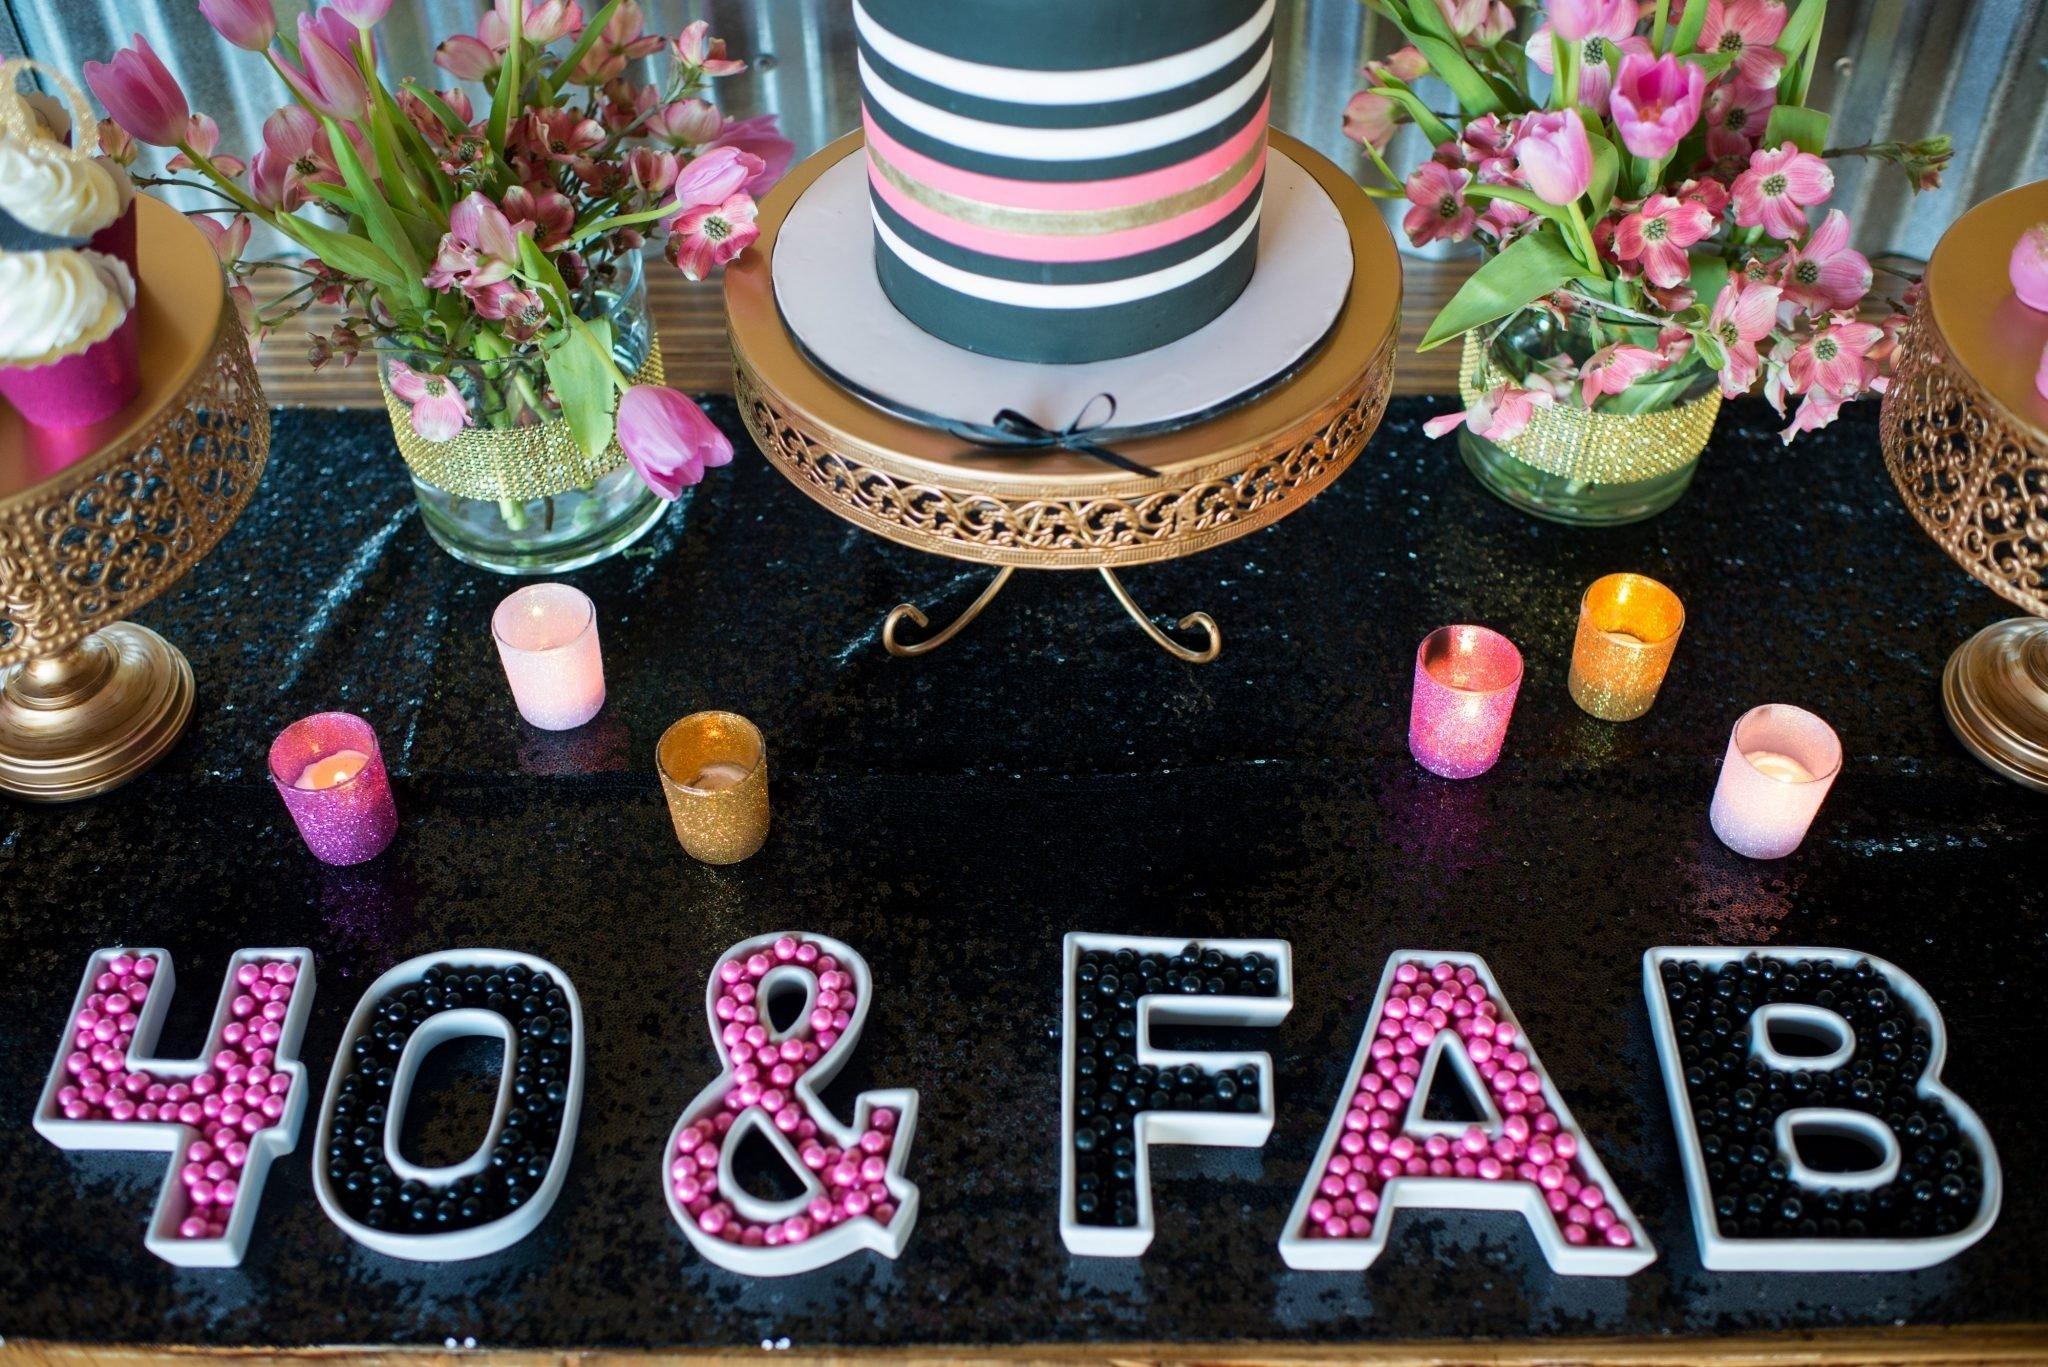 10 Nice Ideas For 40Th Birthday Celebration themes baby shower 40th birthday celebration ideas melbourne 2020